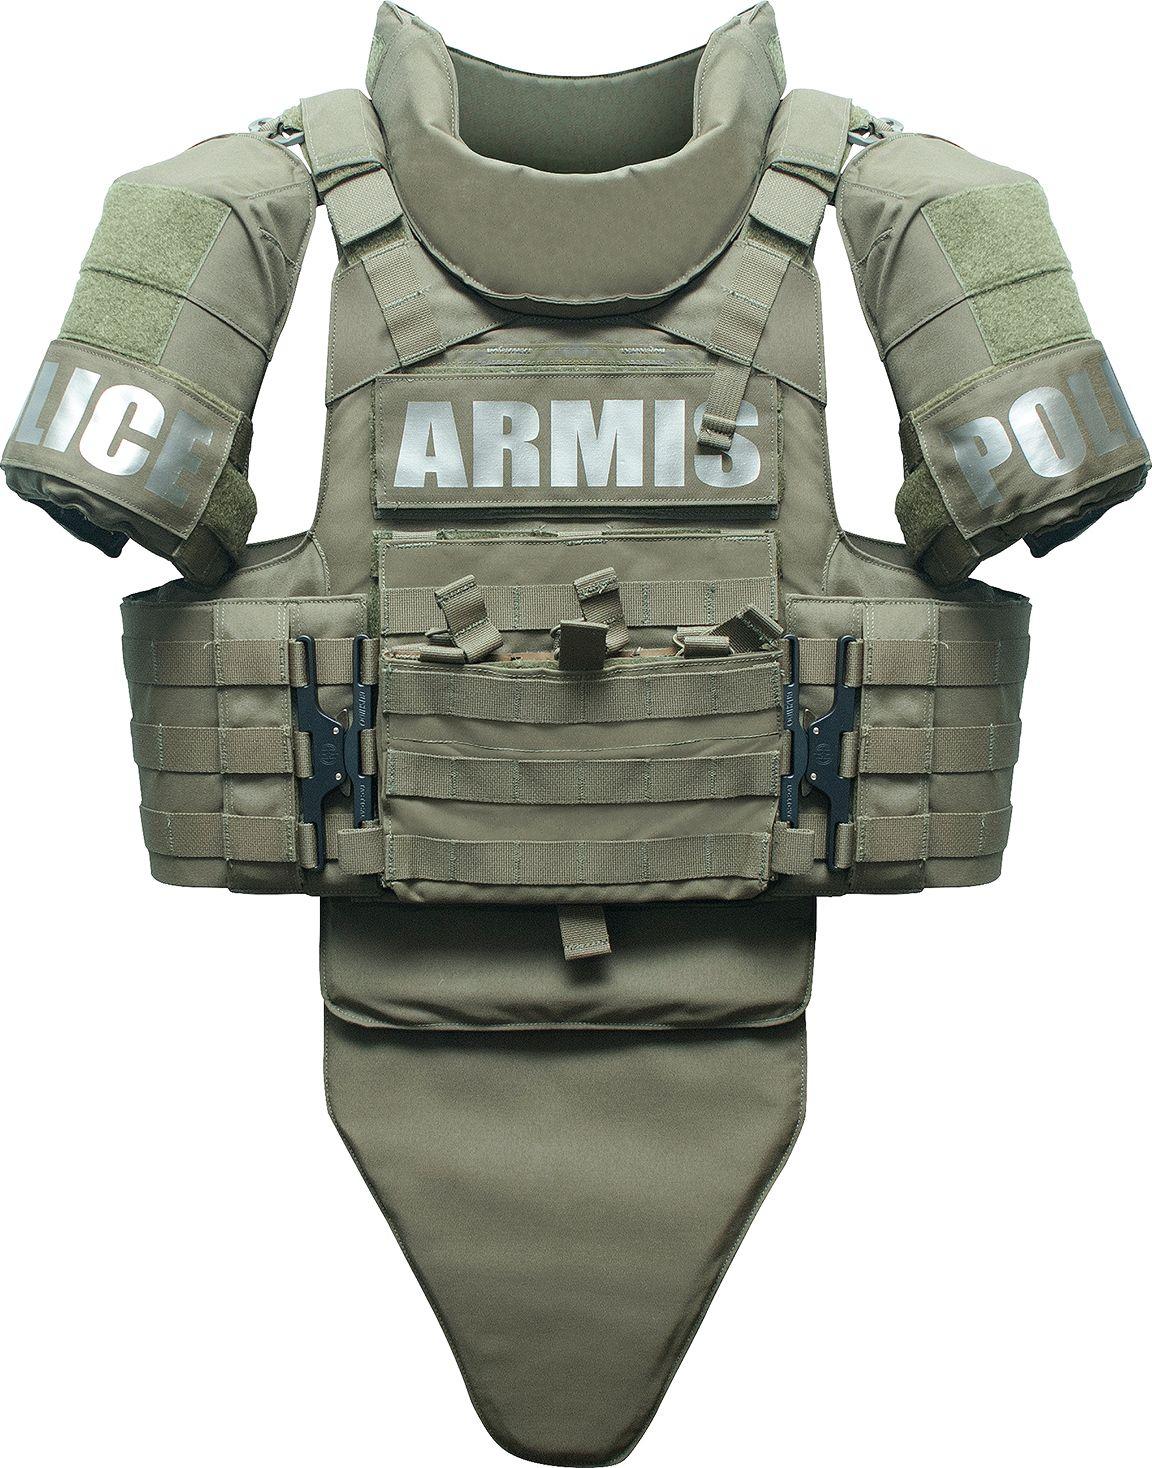 Armis Body Armor System